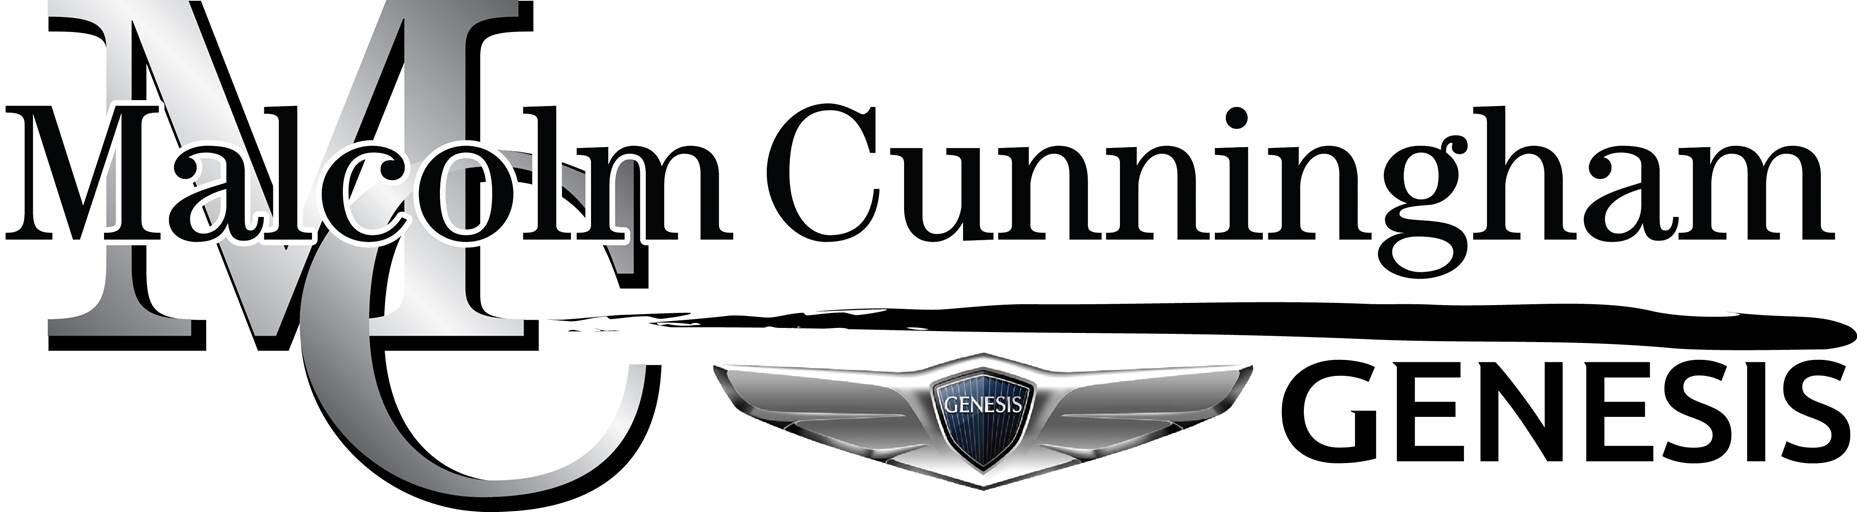 Malcolm Cunningham Automotive New Dealership In Decatur Ga